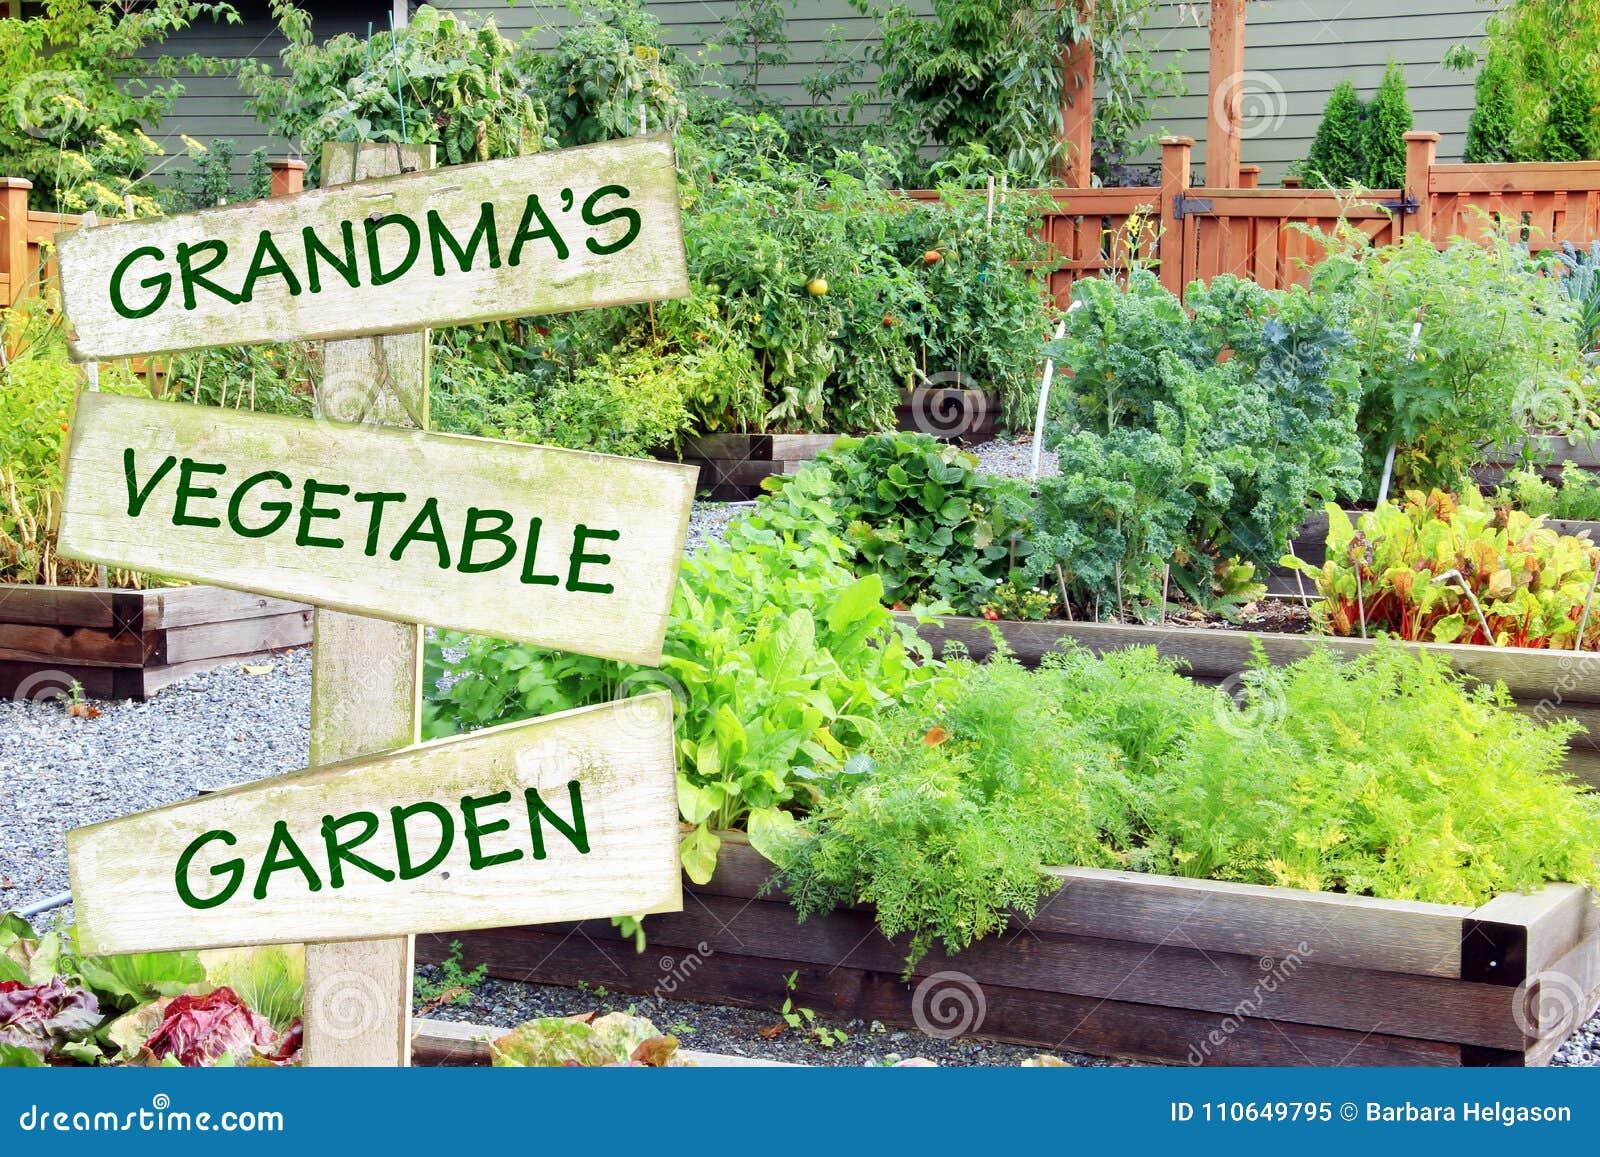 Grandma`s Vegetable Garden. Organic Community Garden Growing Vegetables,  Herbs And Fruit.